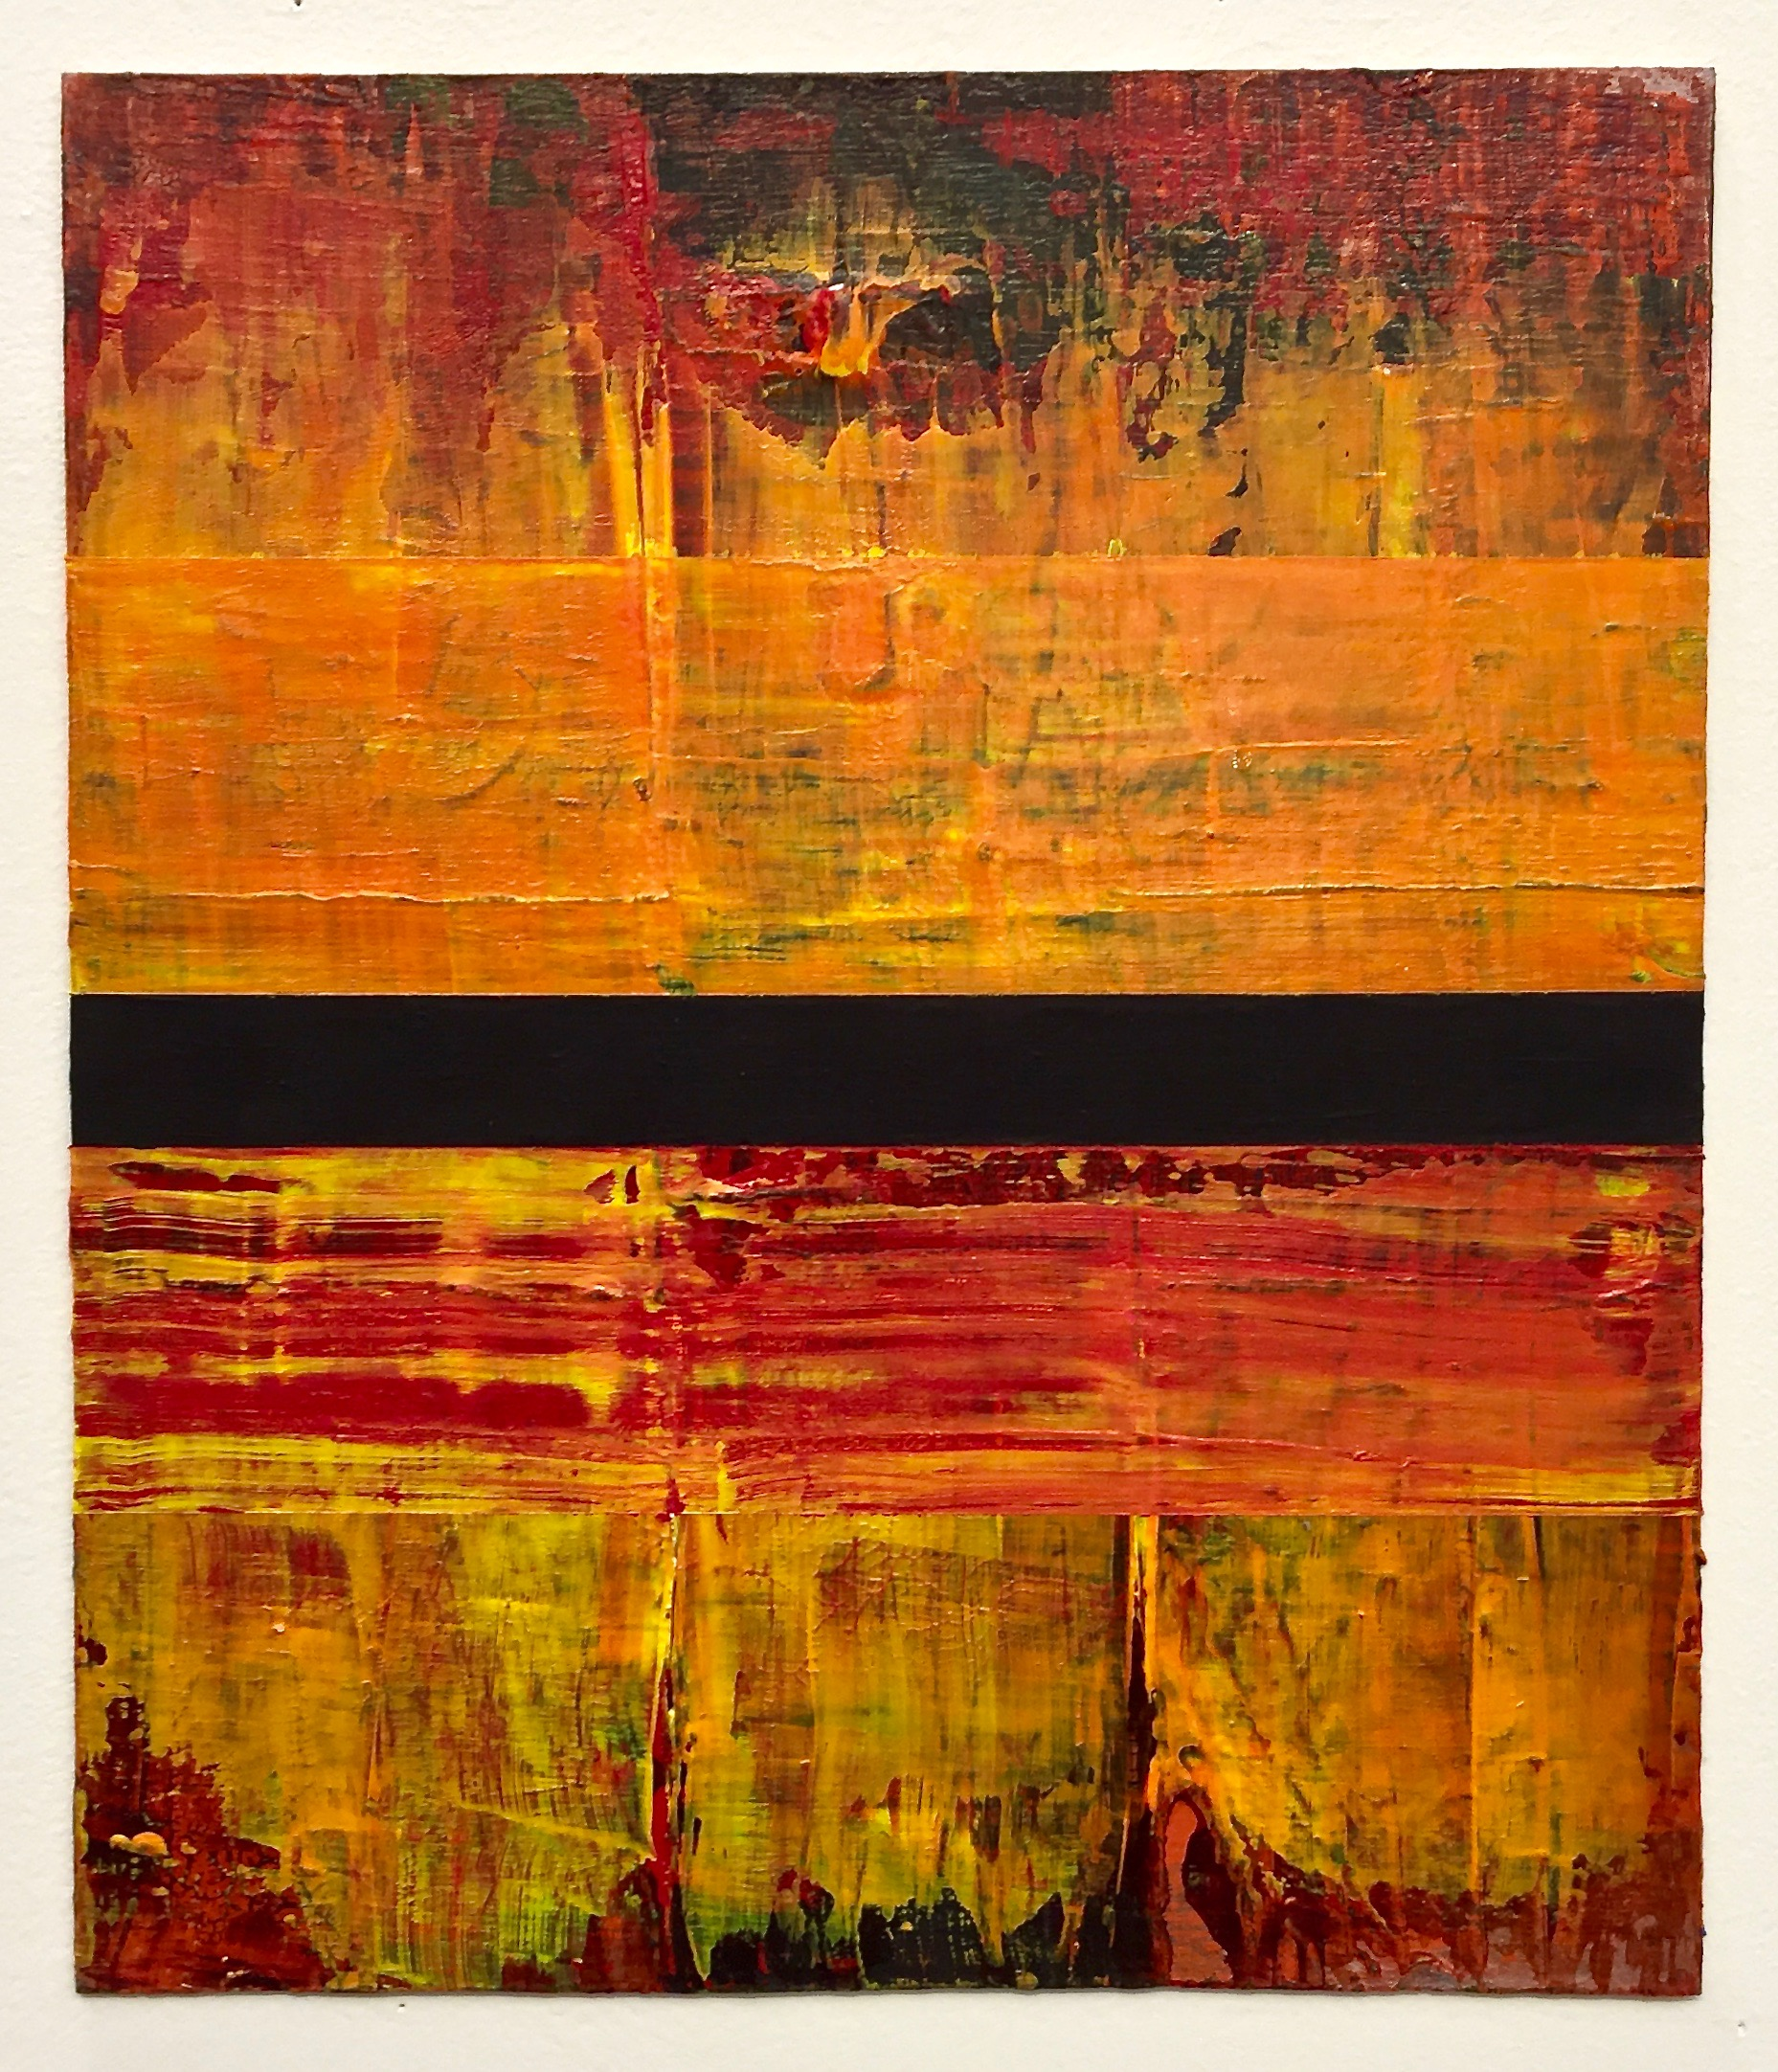 Untitled (Negative), 2016